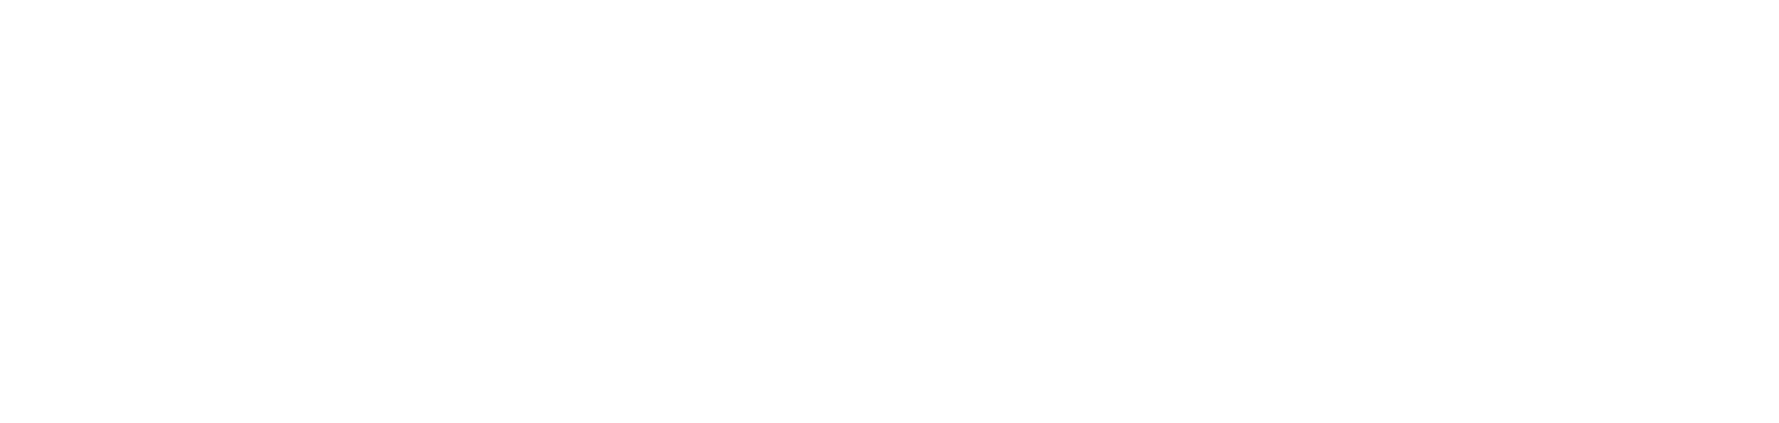 Campfire-Music